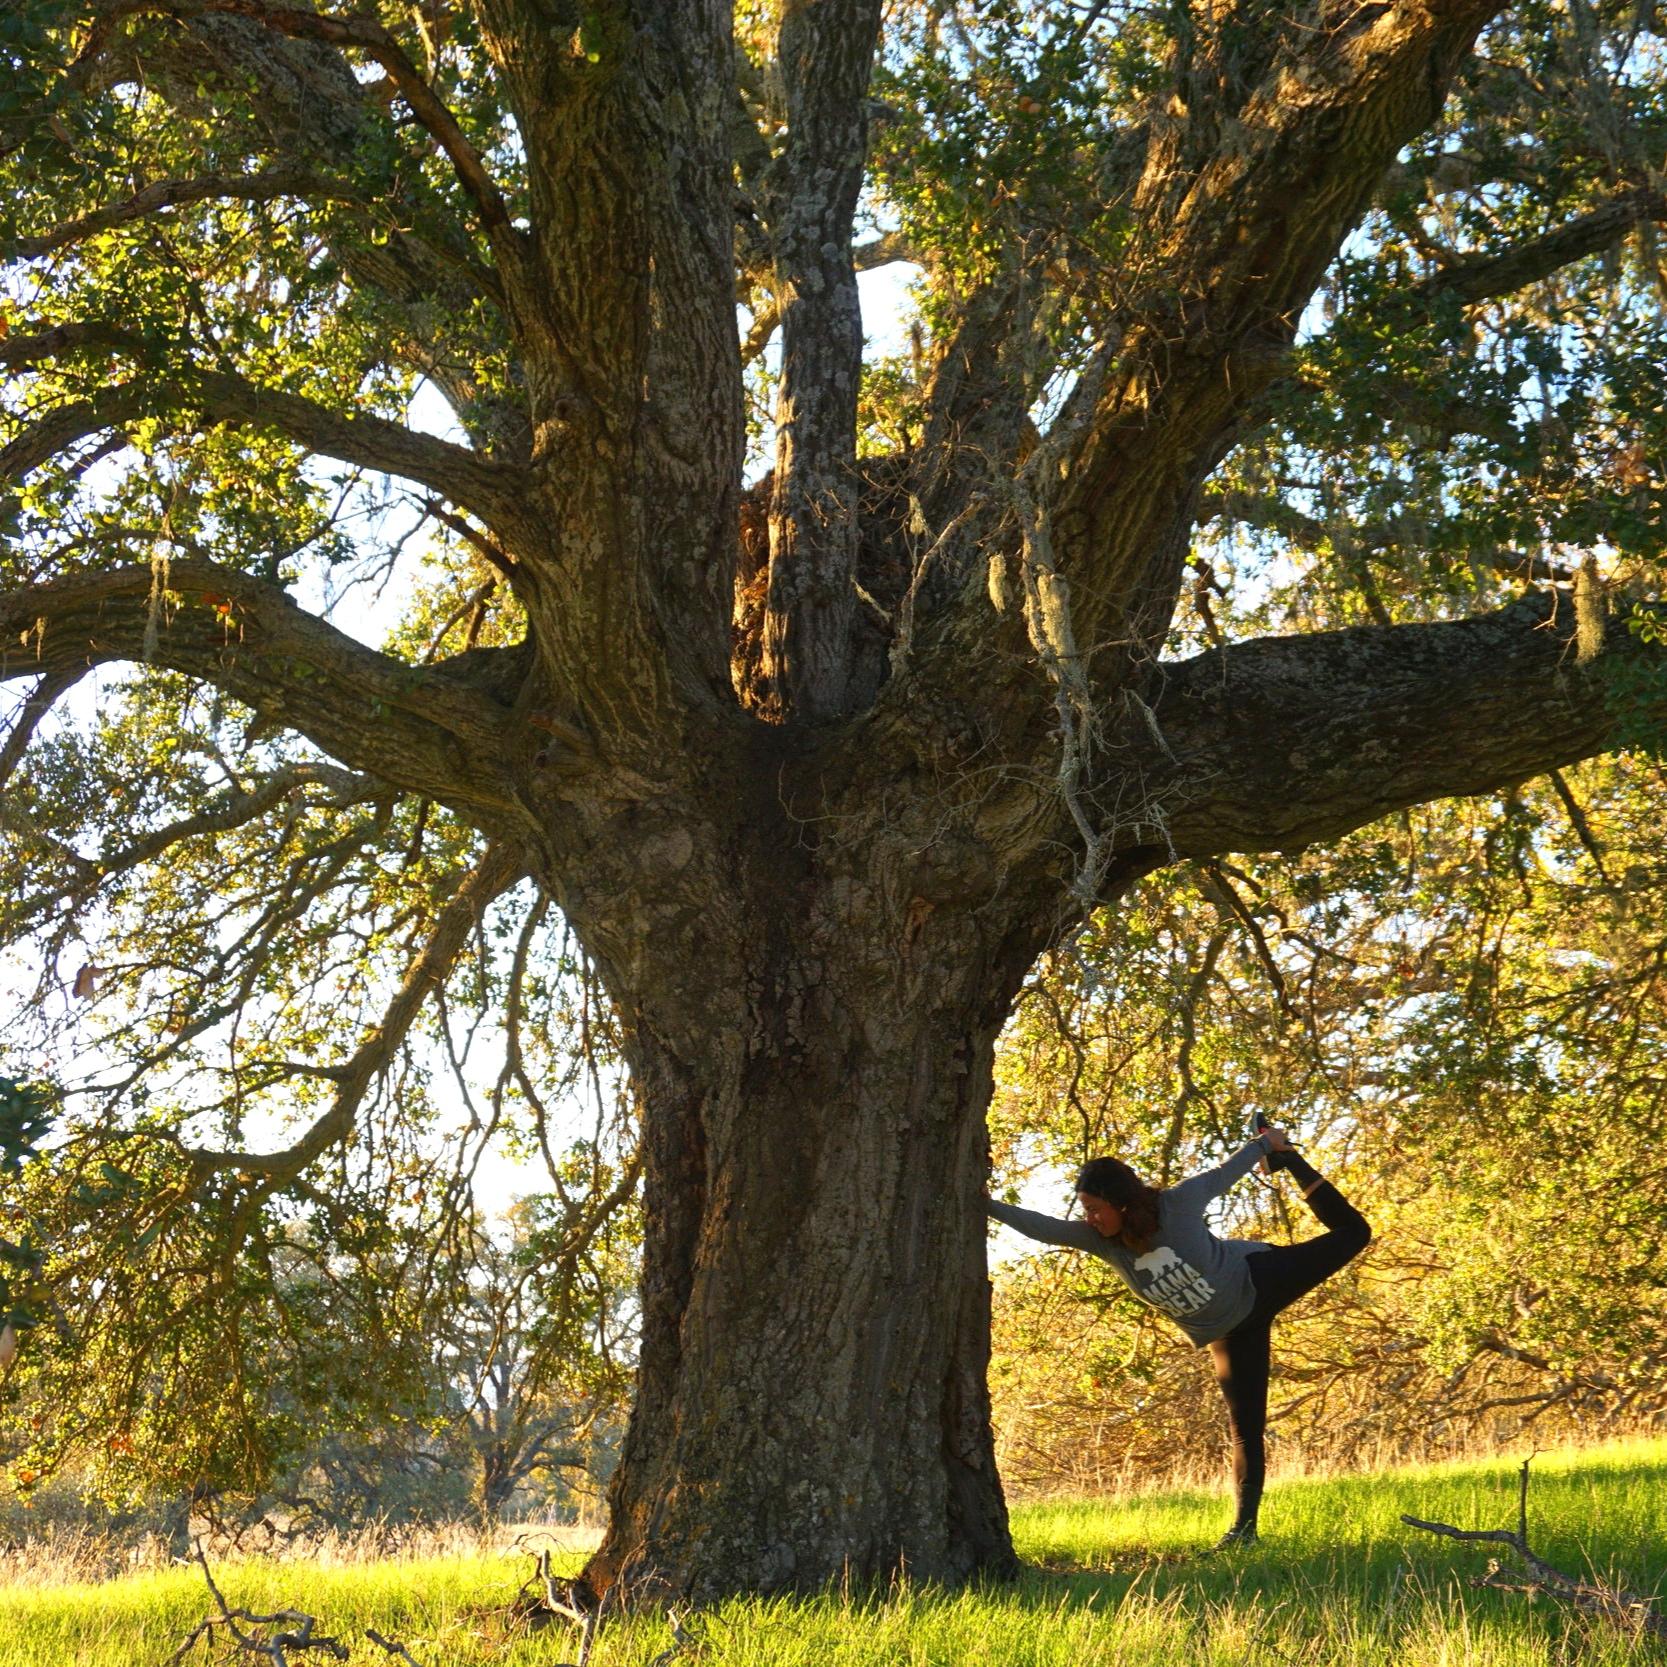 Sagrada Wellness Yoga Retreats